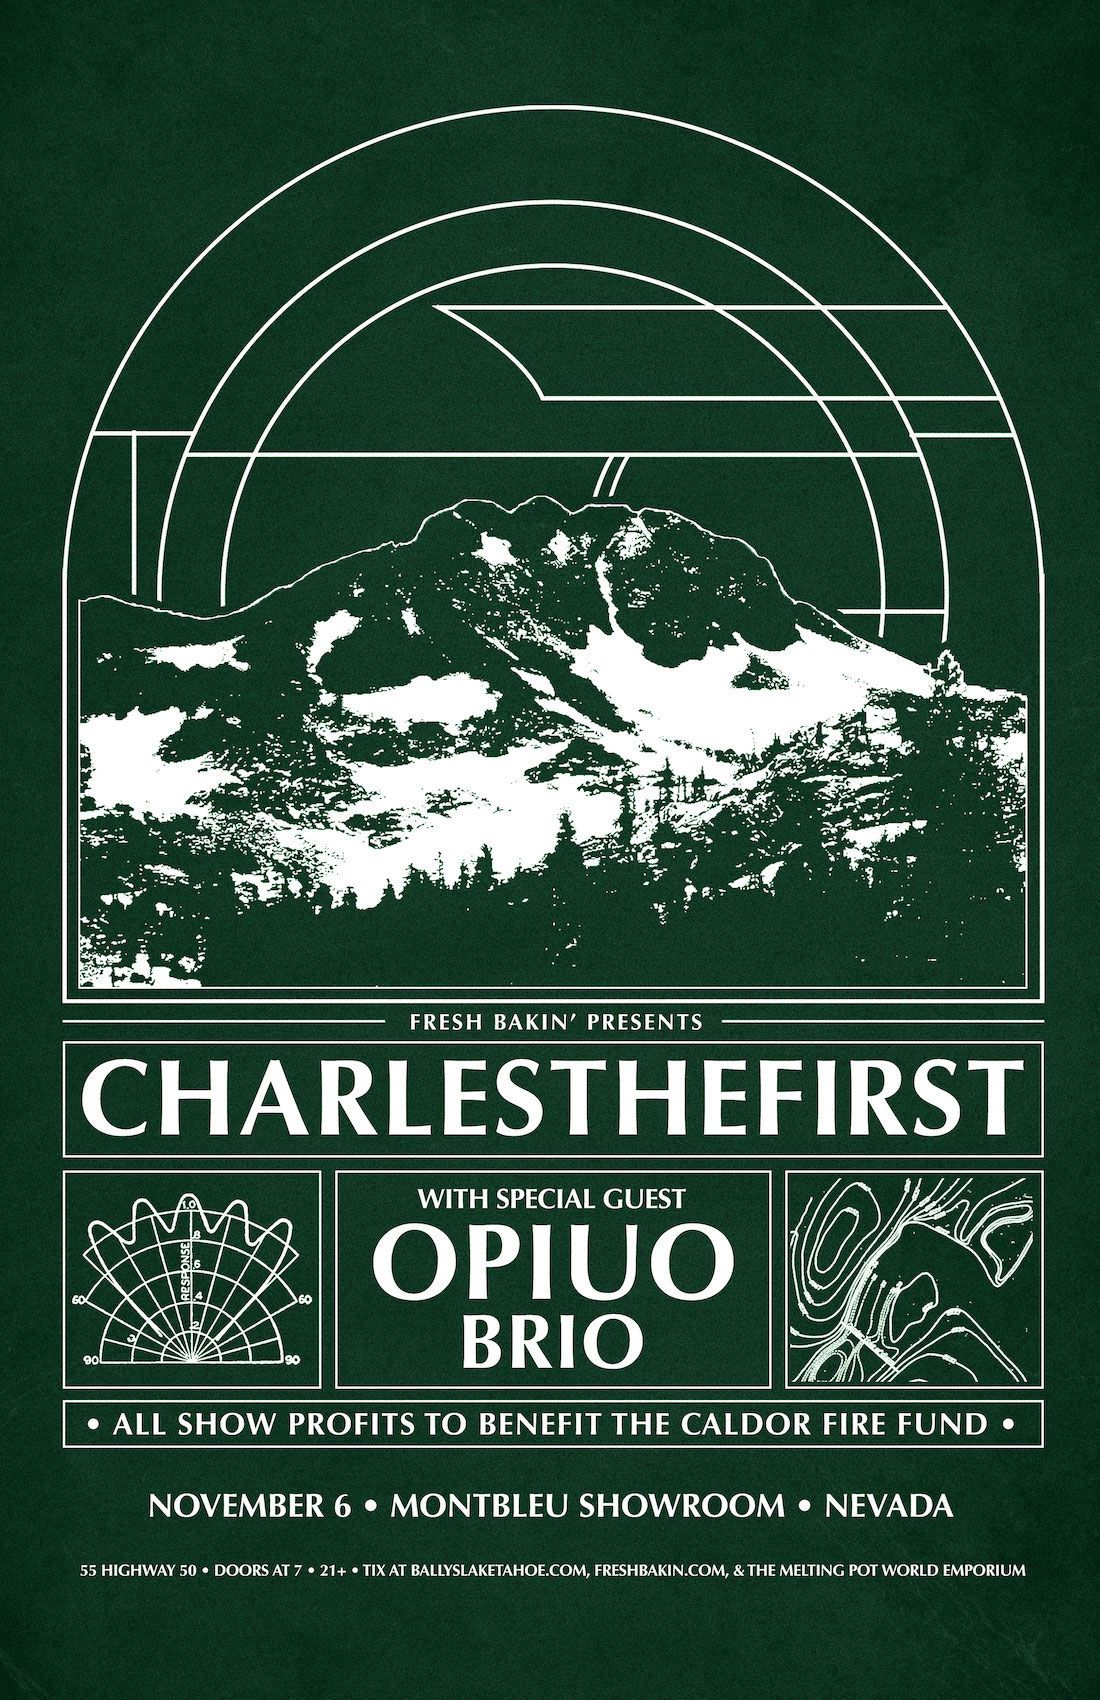 Charlesthefirst &Opiuo in South Tahoe 11/6/2021